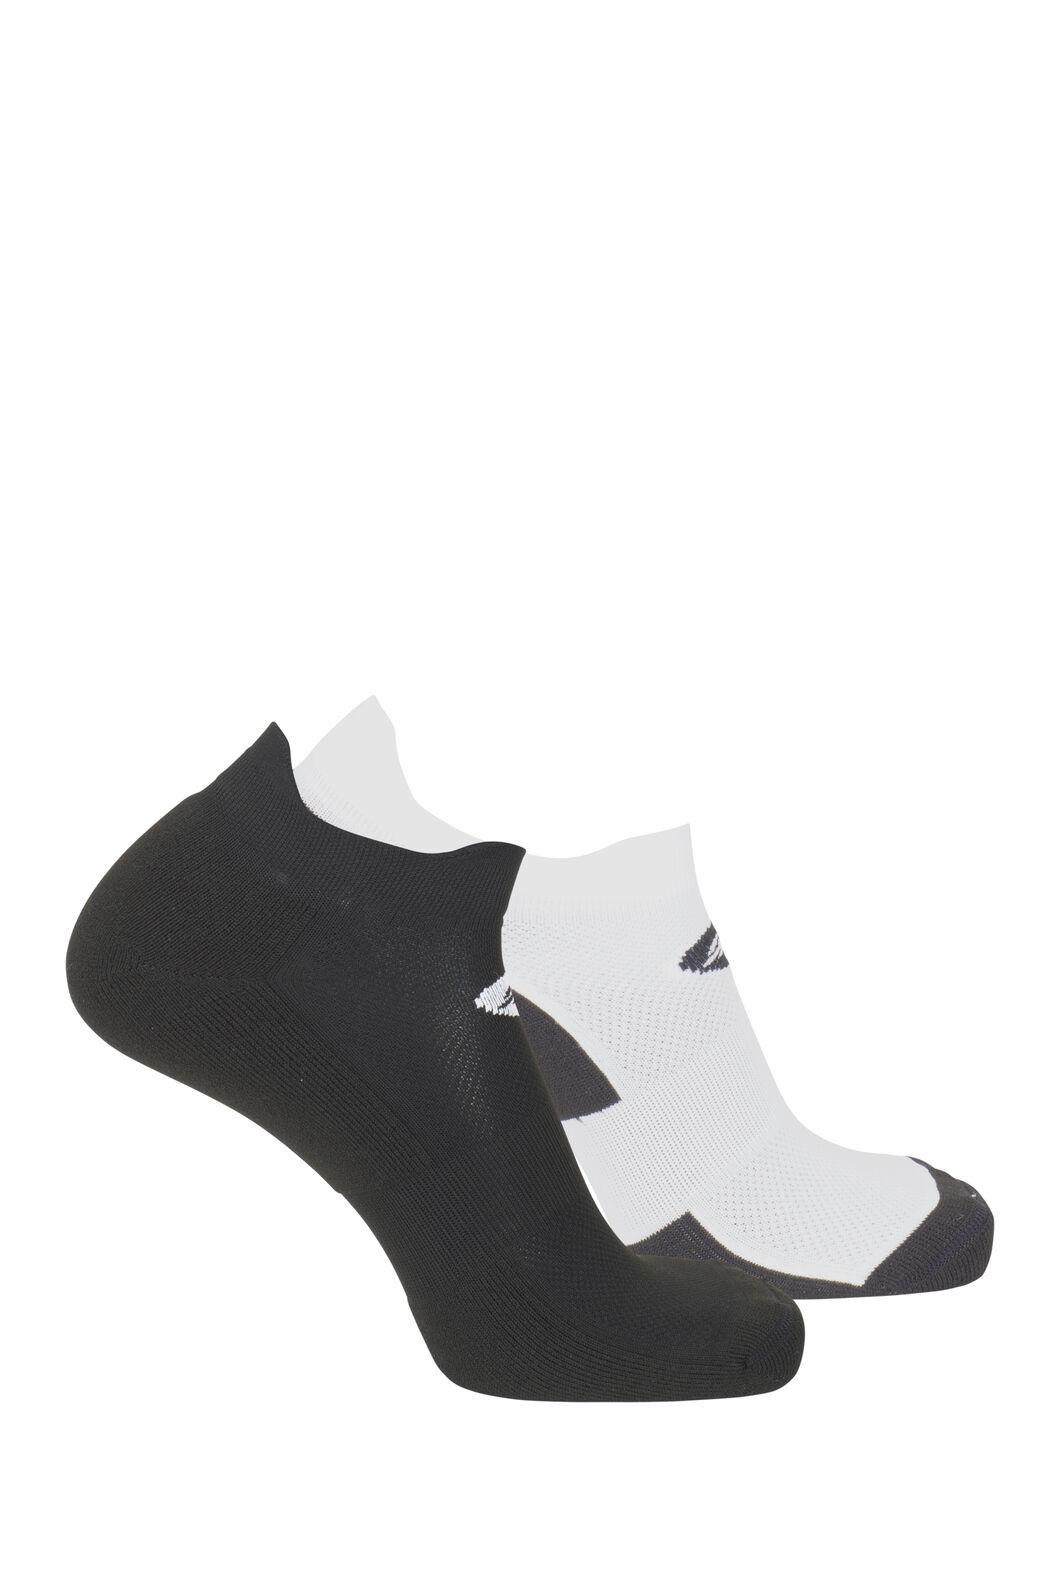 Macpac Light Trail Run Sock (2 Pack), Black/White, hi-res